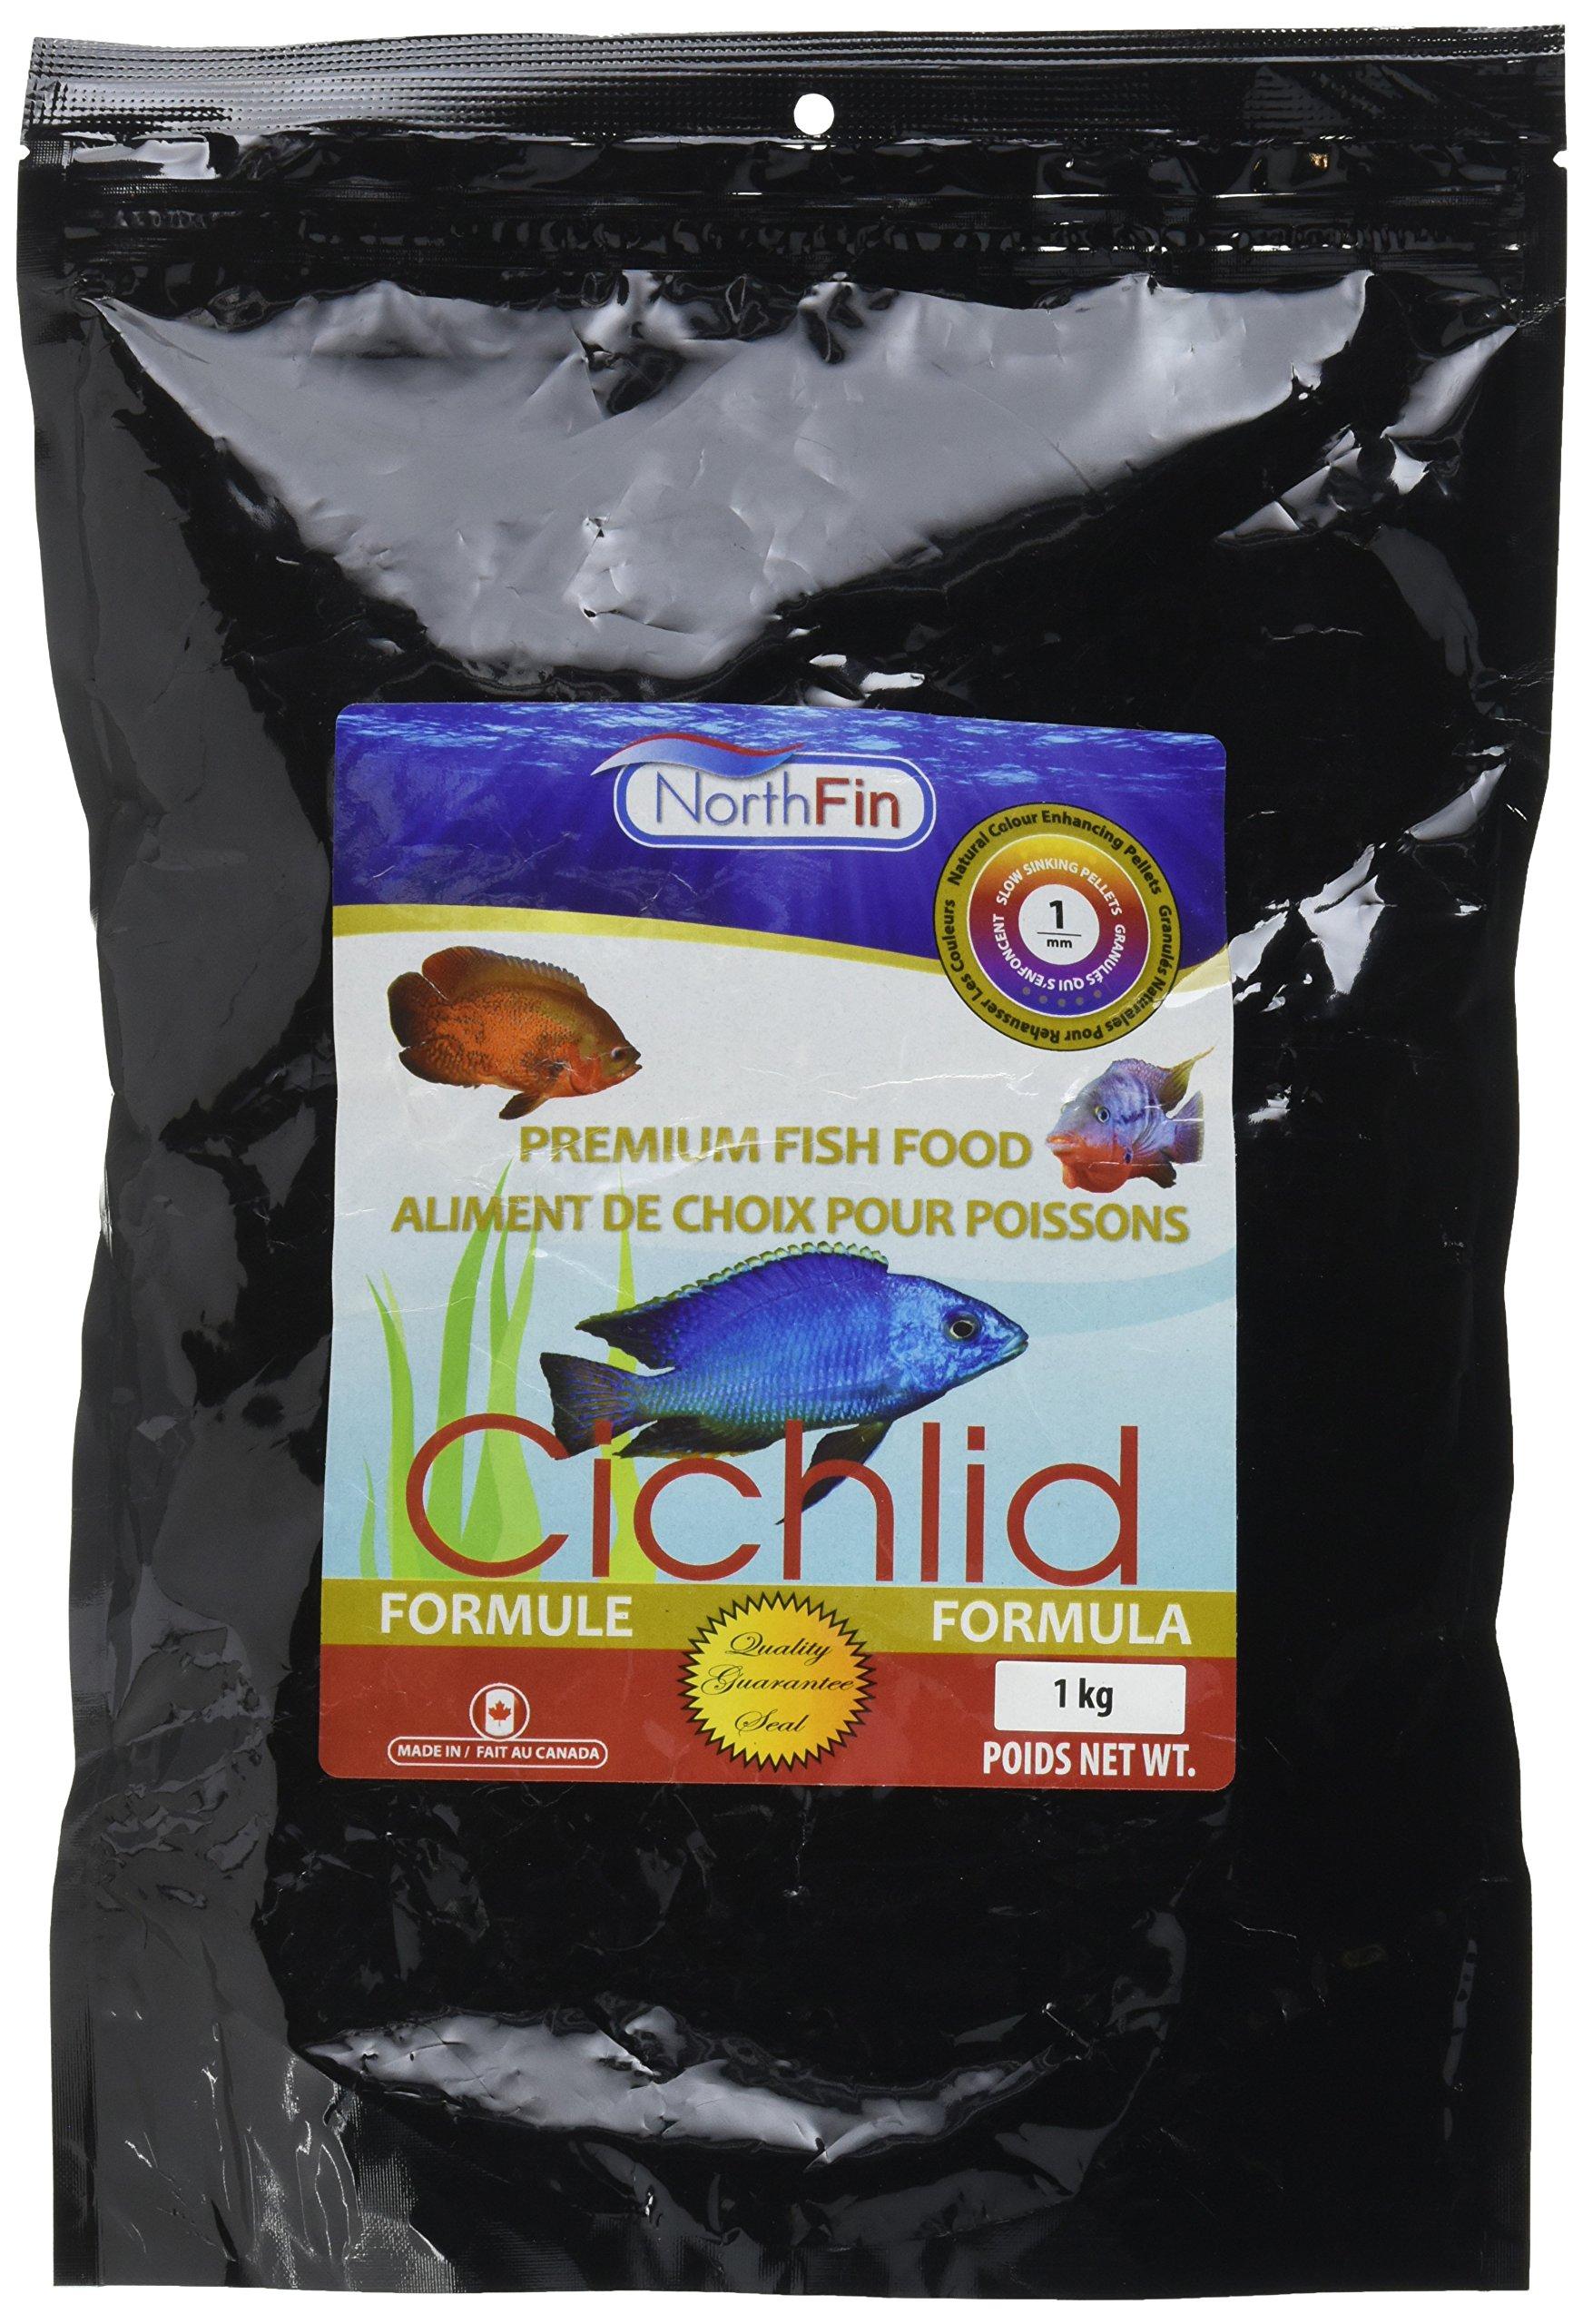 Northfin Food Cichlid Formula 1Mm Pellet 1Kg Package by Northfin